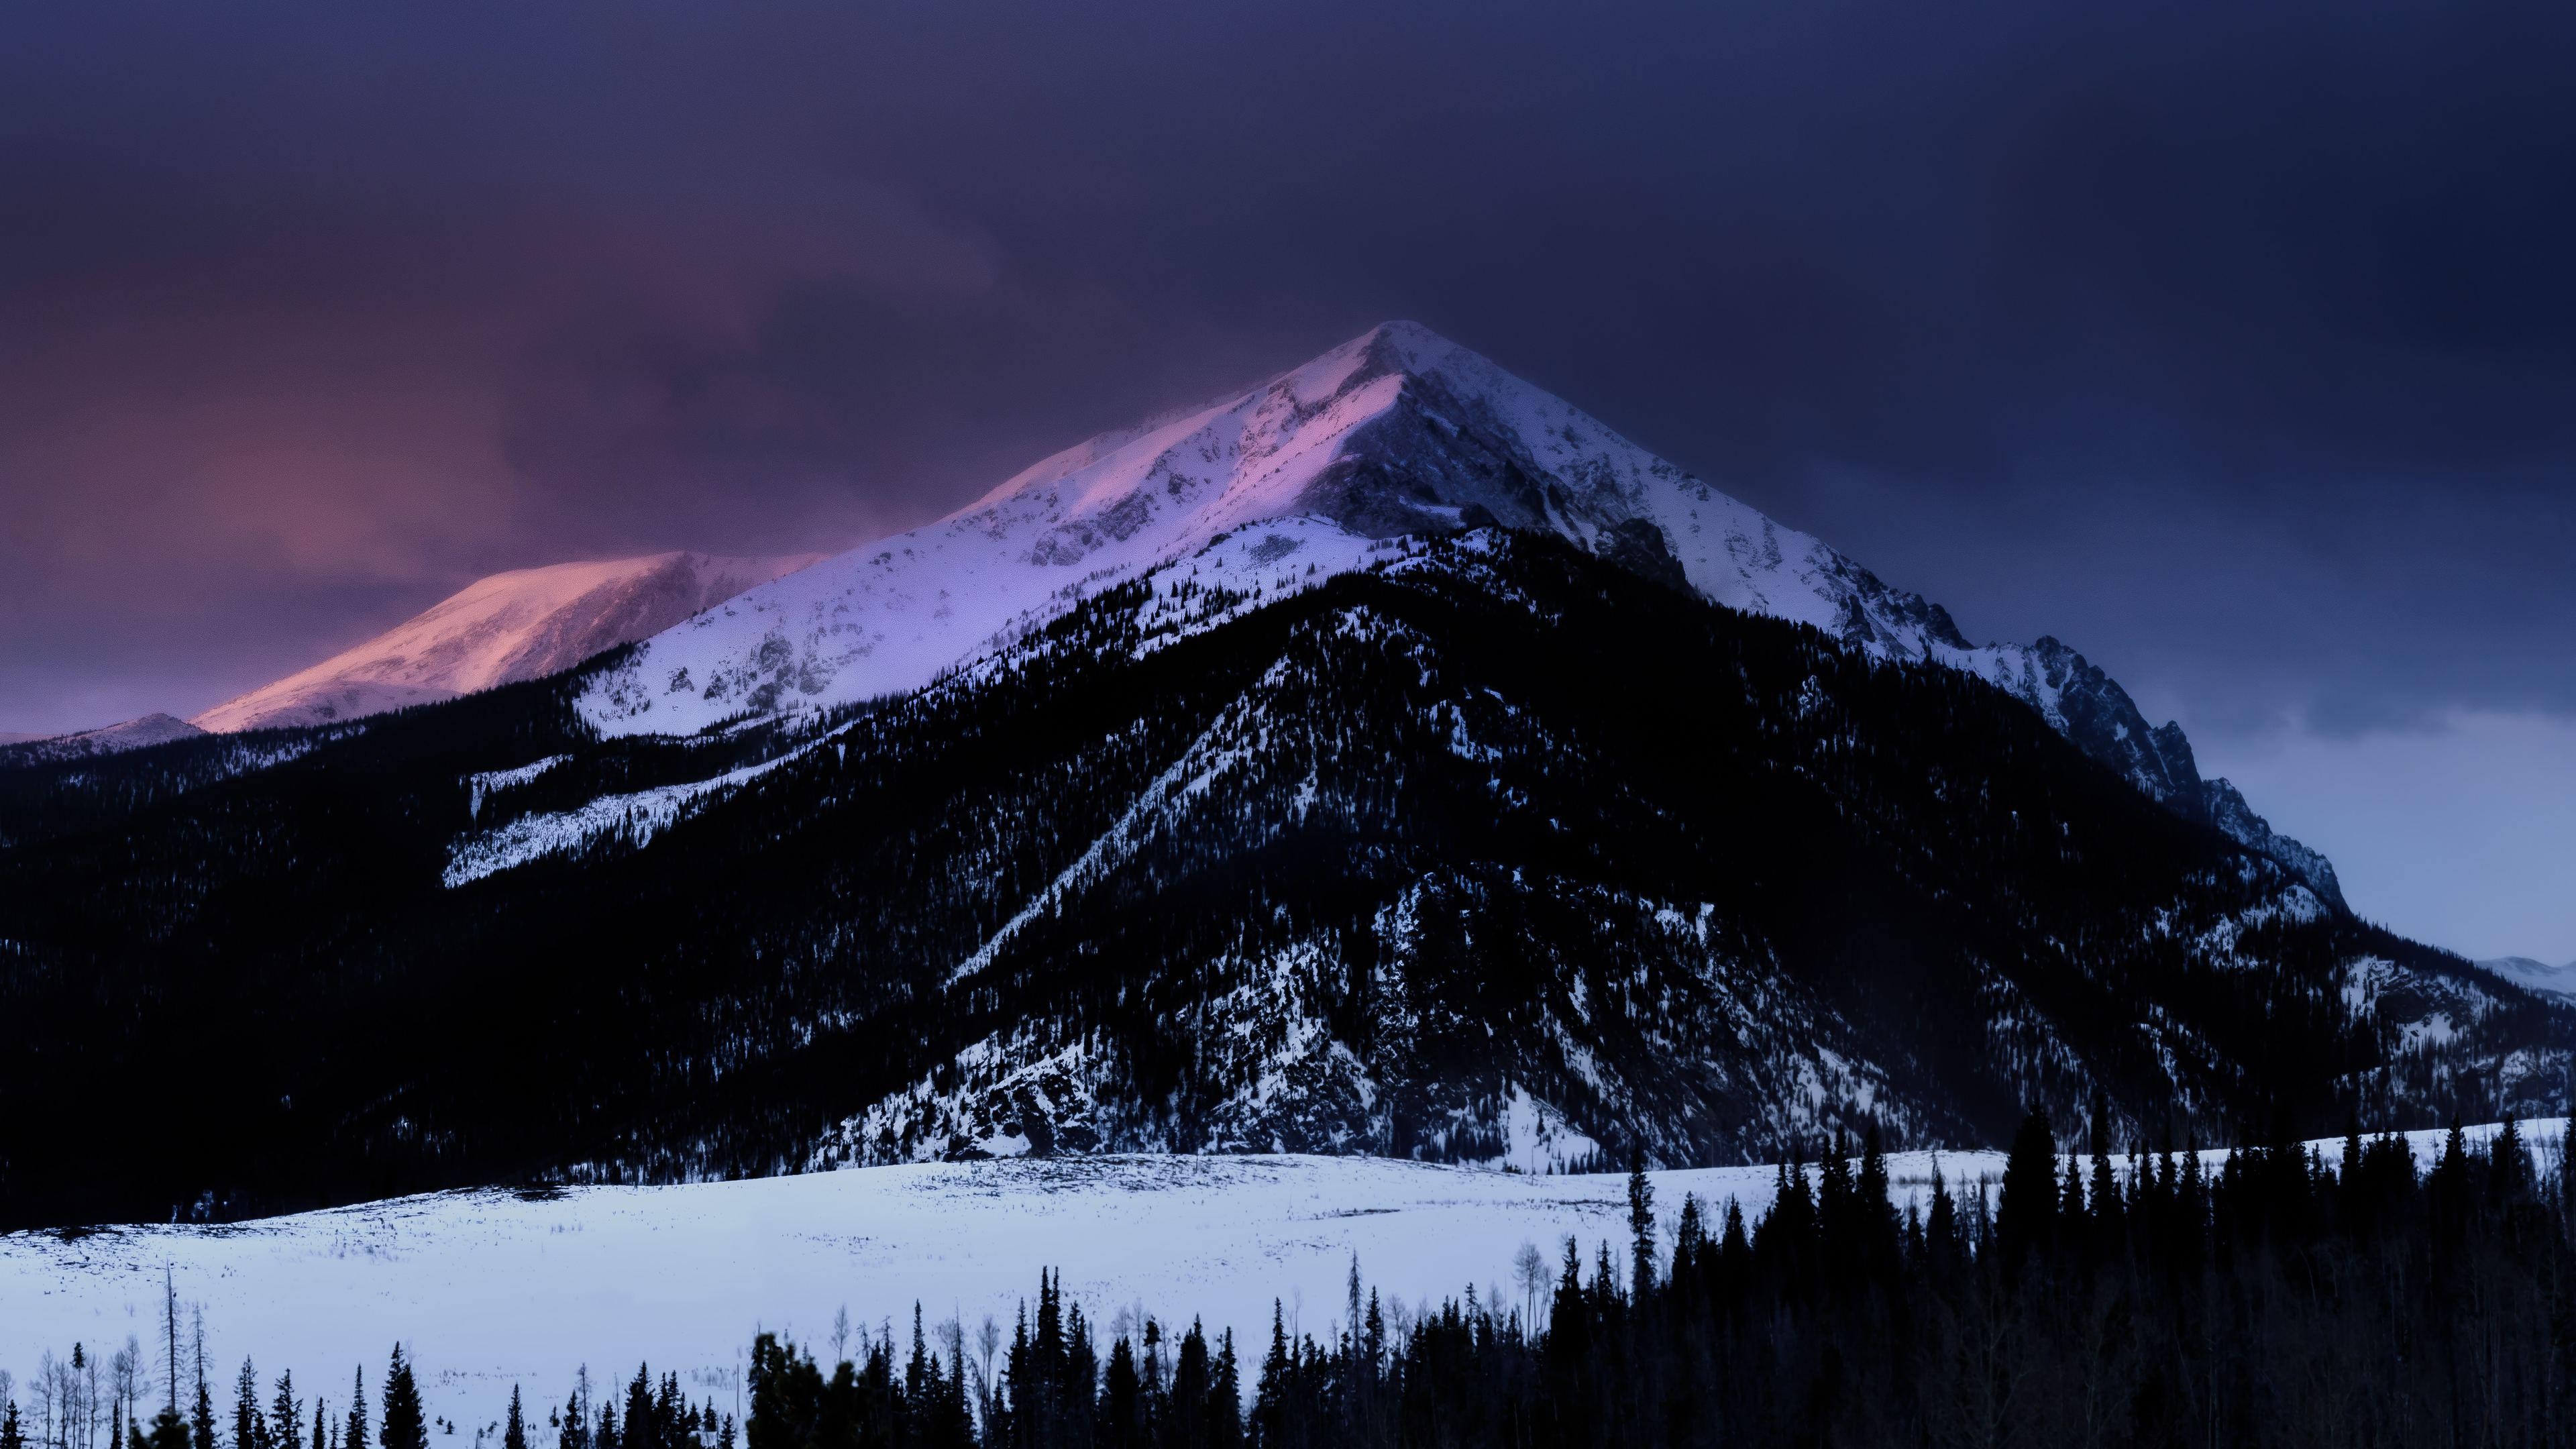 Wallpaper 4k Mountains Peak Snow 4k 4k Wallpapers 5k